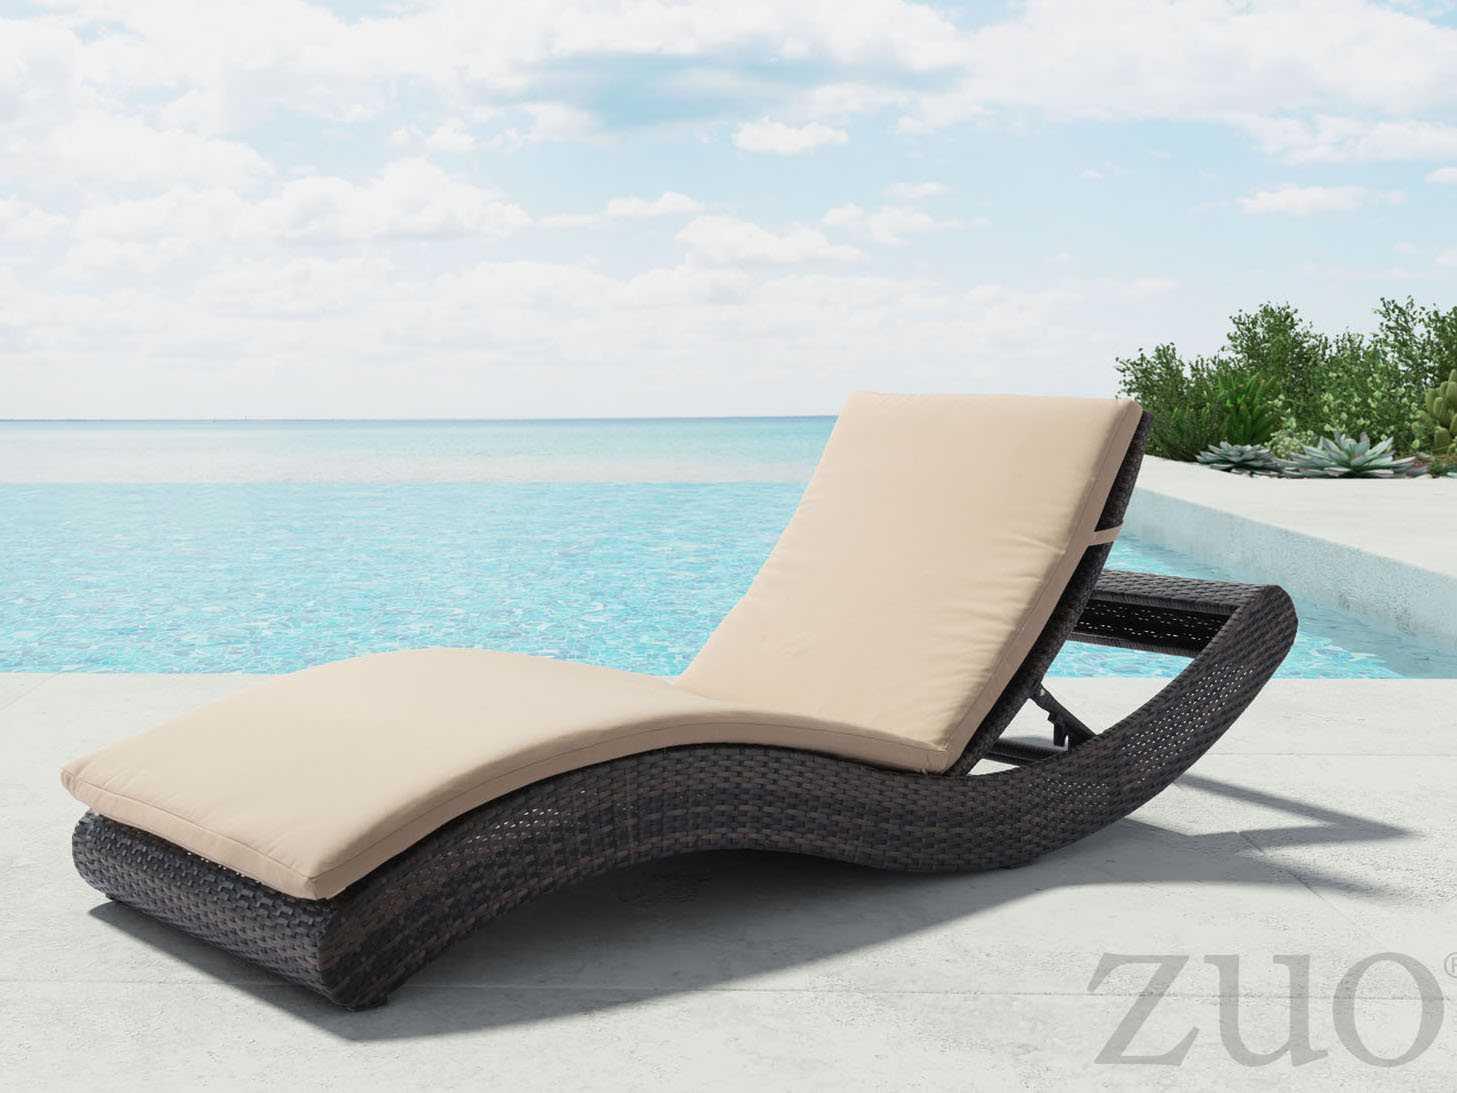 Zuo outdoor pamelon beach aluminum wicker beach chaise for Beach chaise lounges